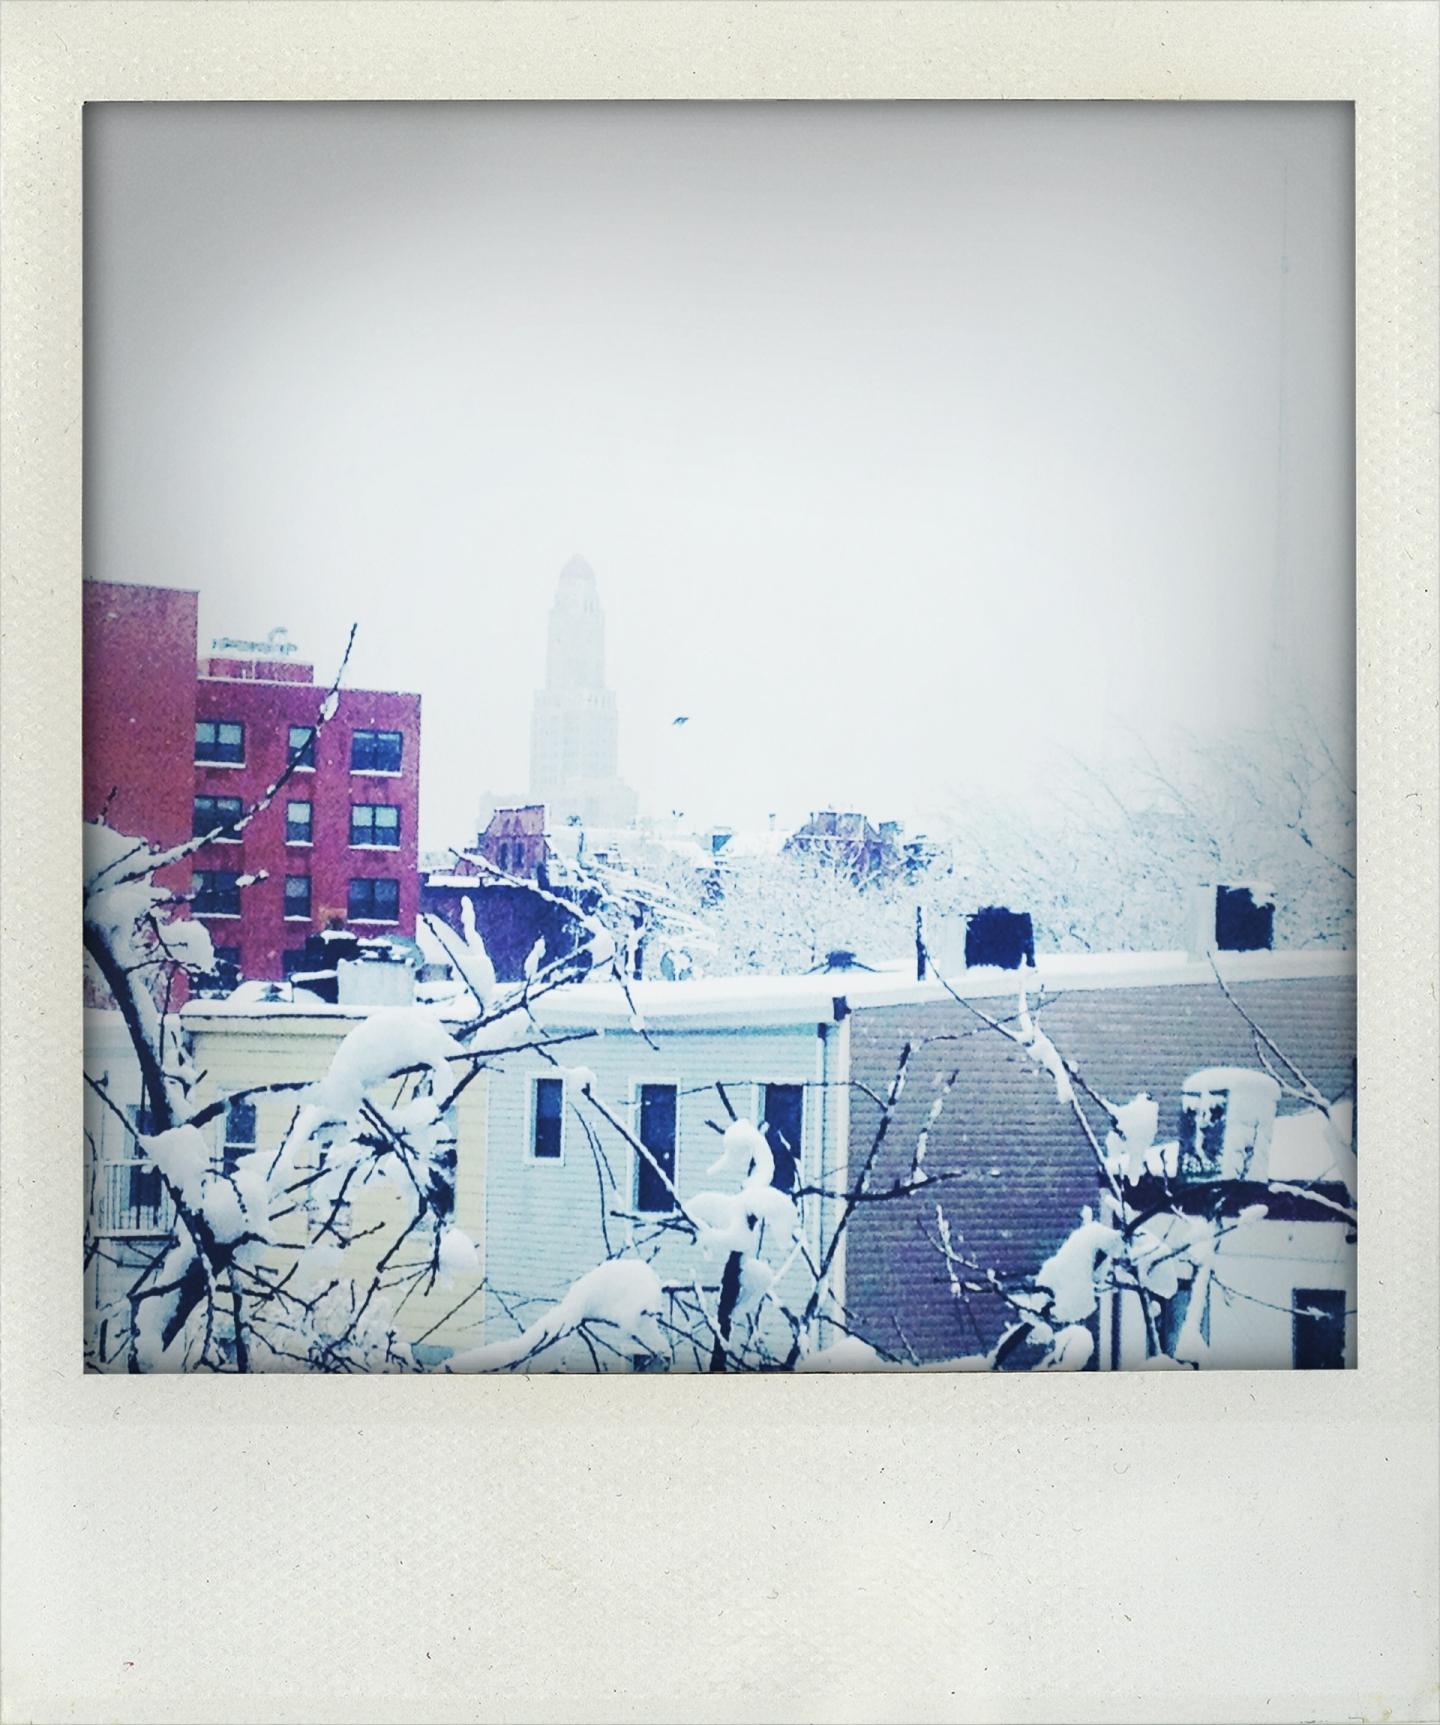 brooklyn_february_snowstorm